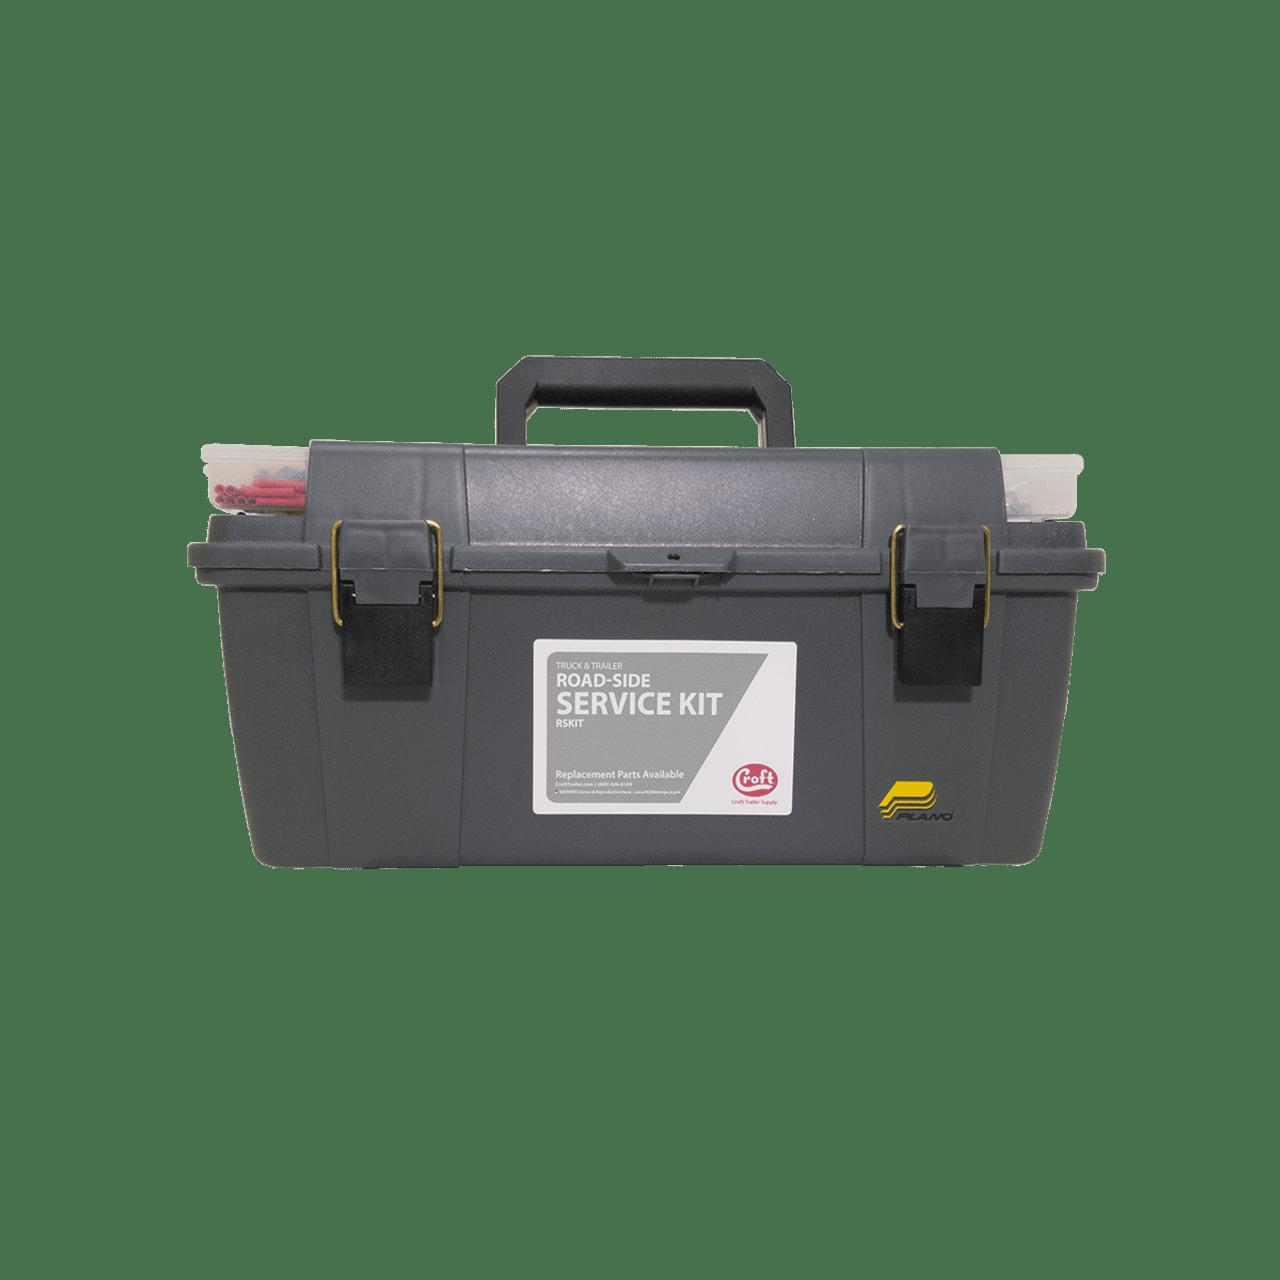 RSKIT --- Roadside Service Kit